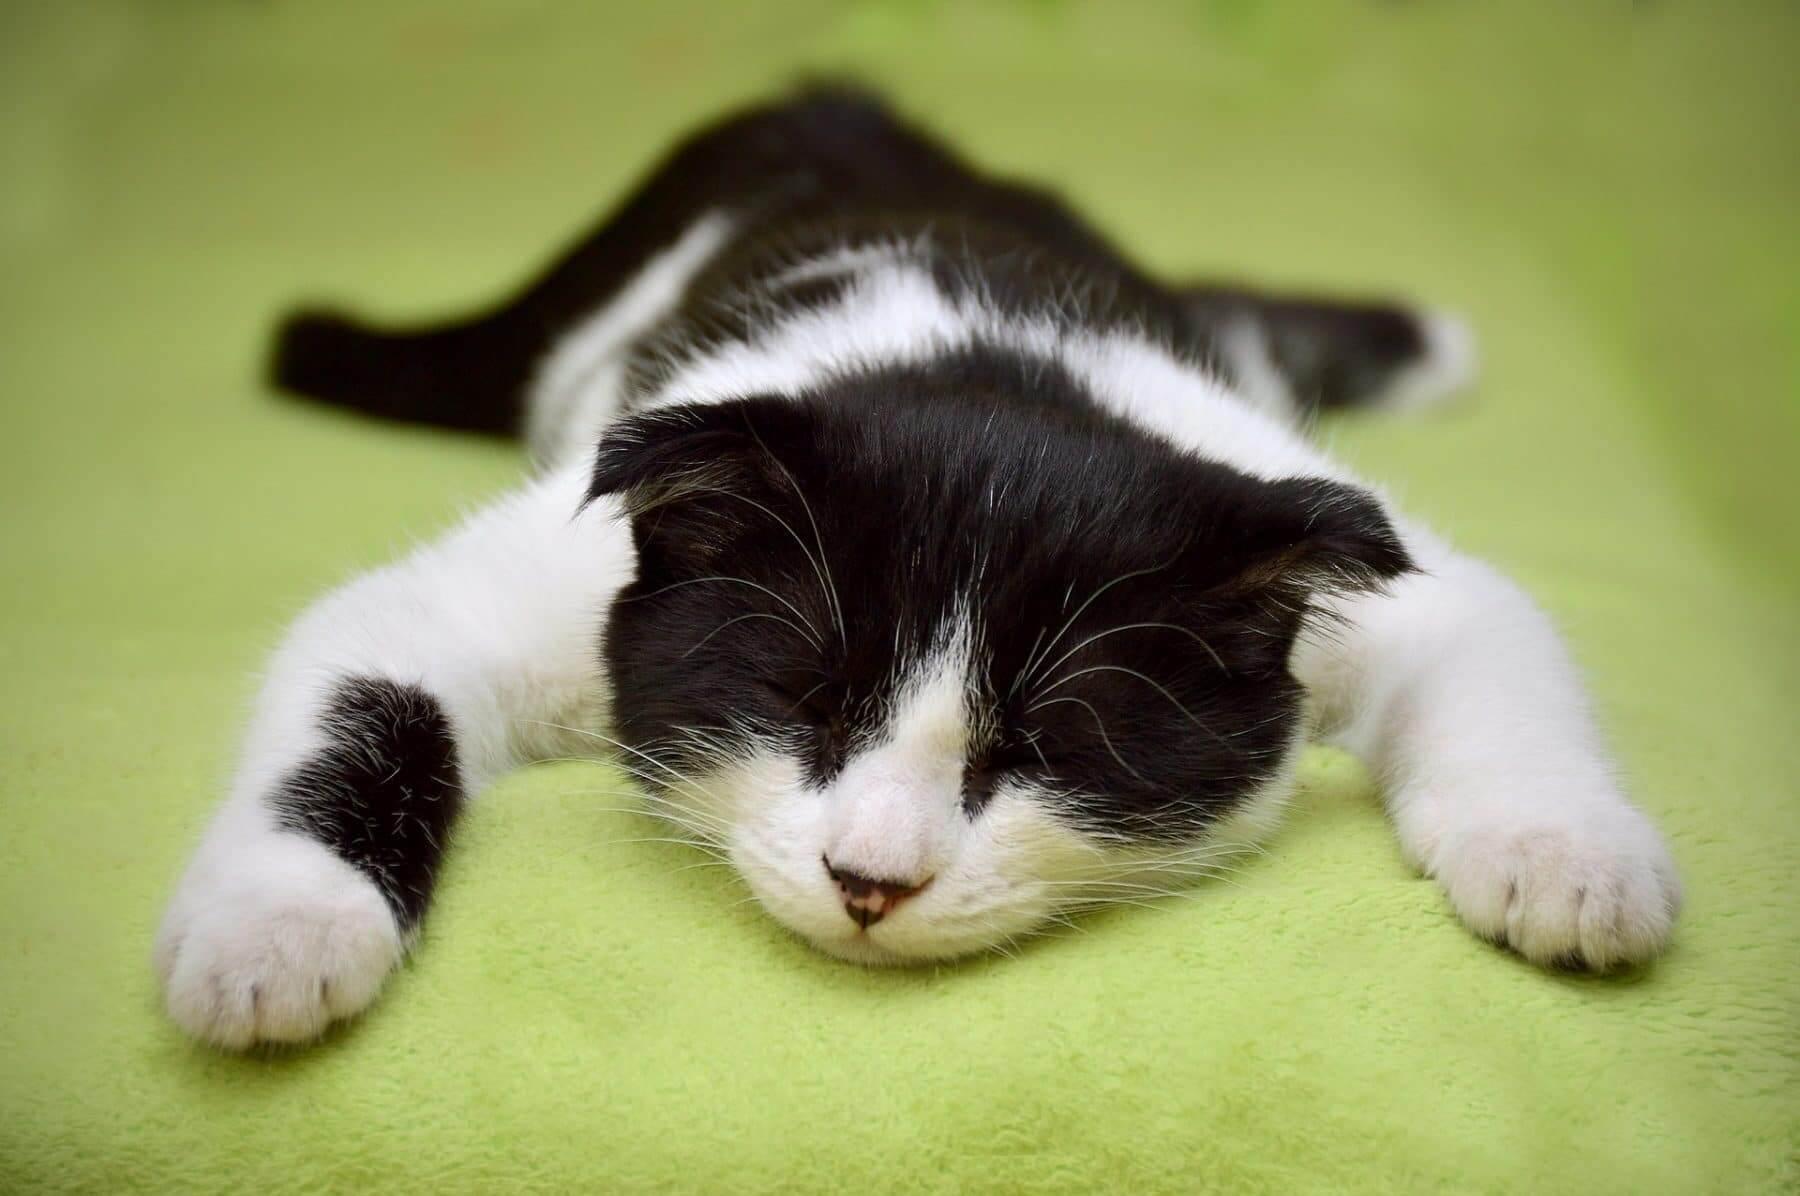 kucing lemas karena detak jantung melemah